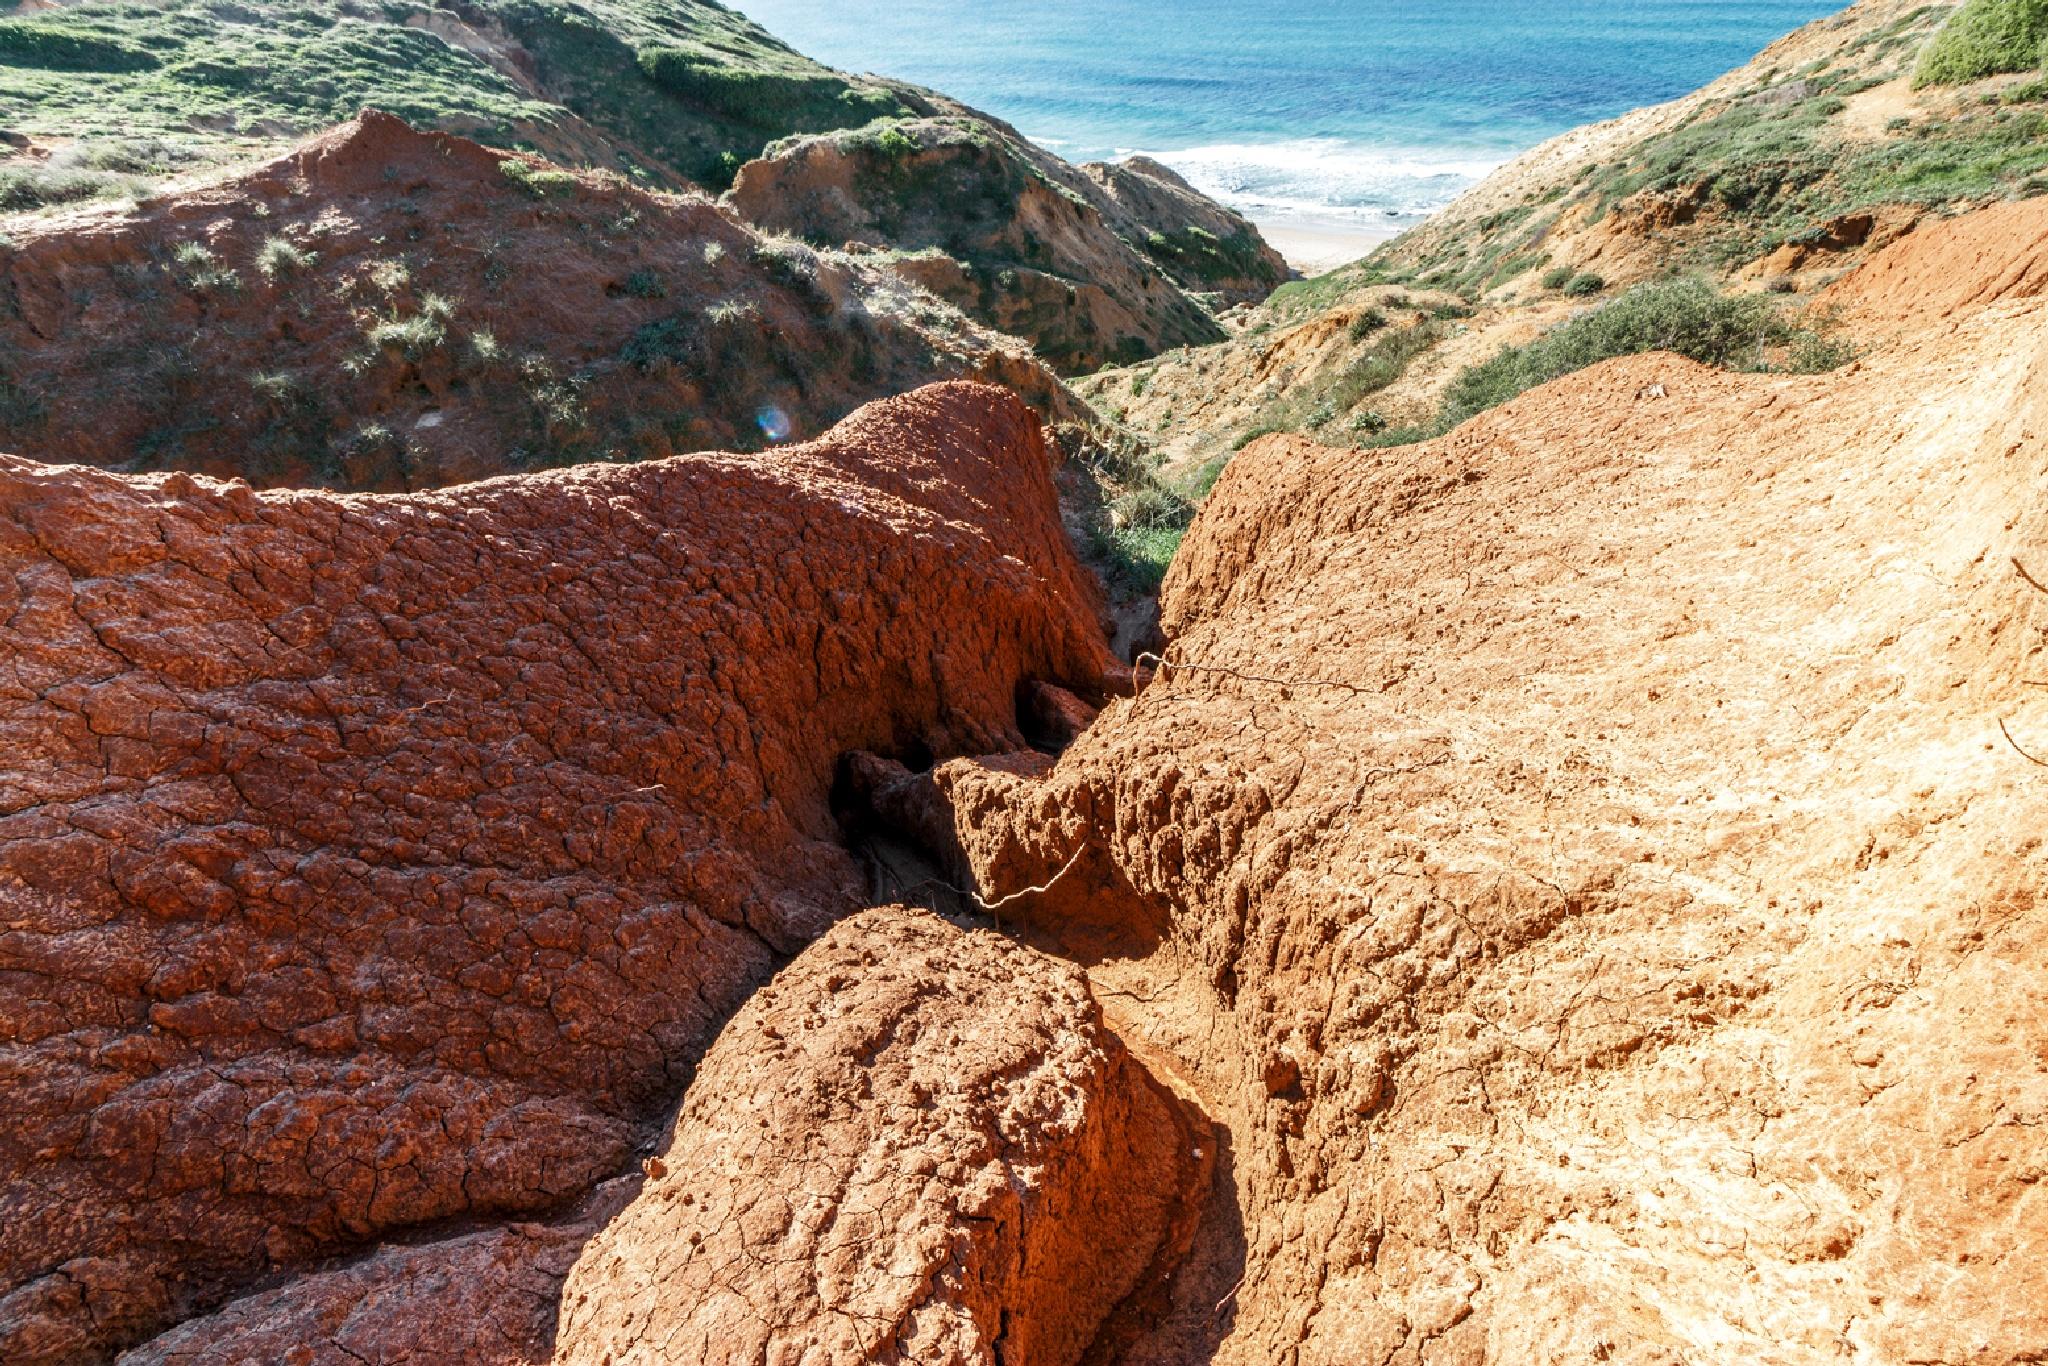 Land-sea-scape by Anatoly Vinokurov